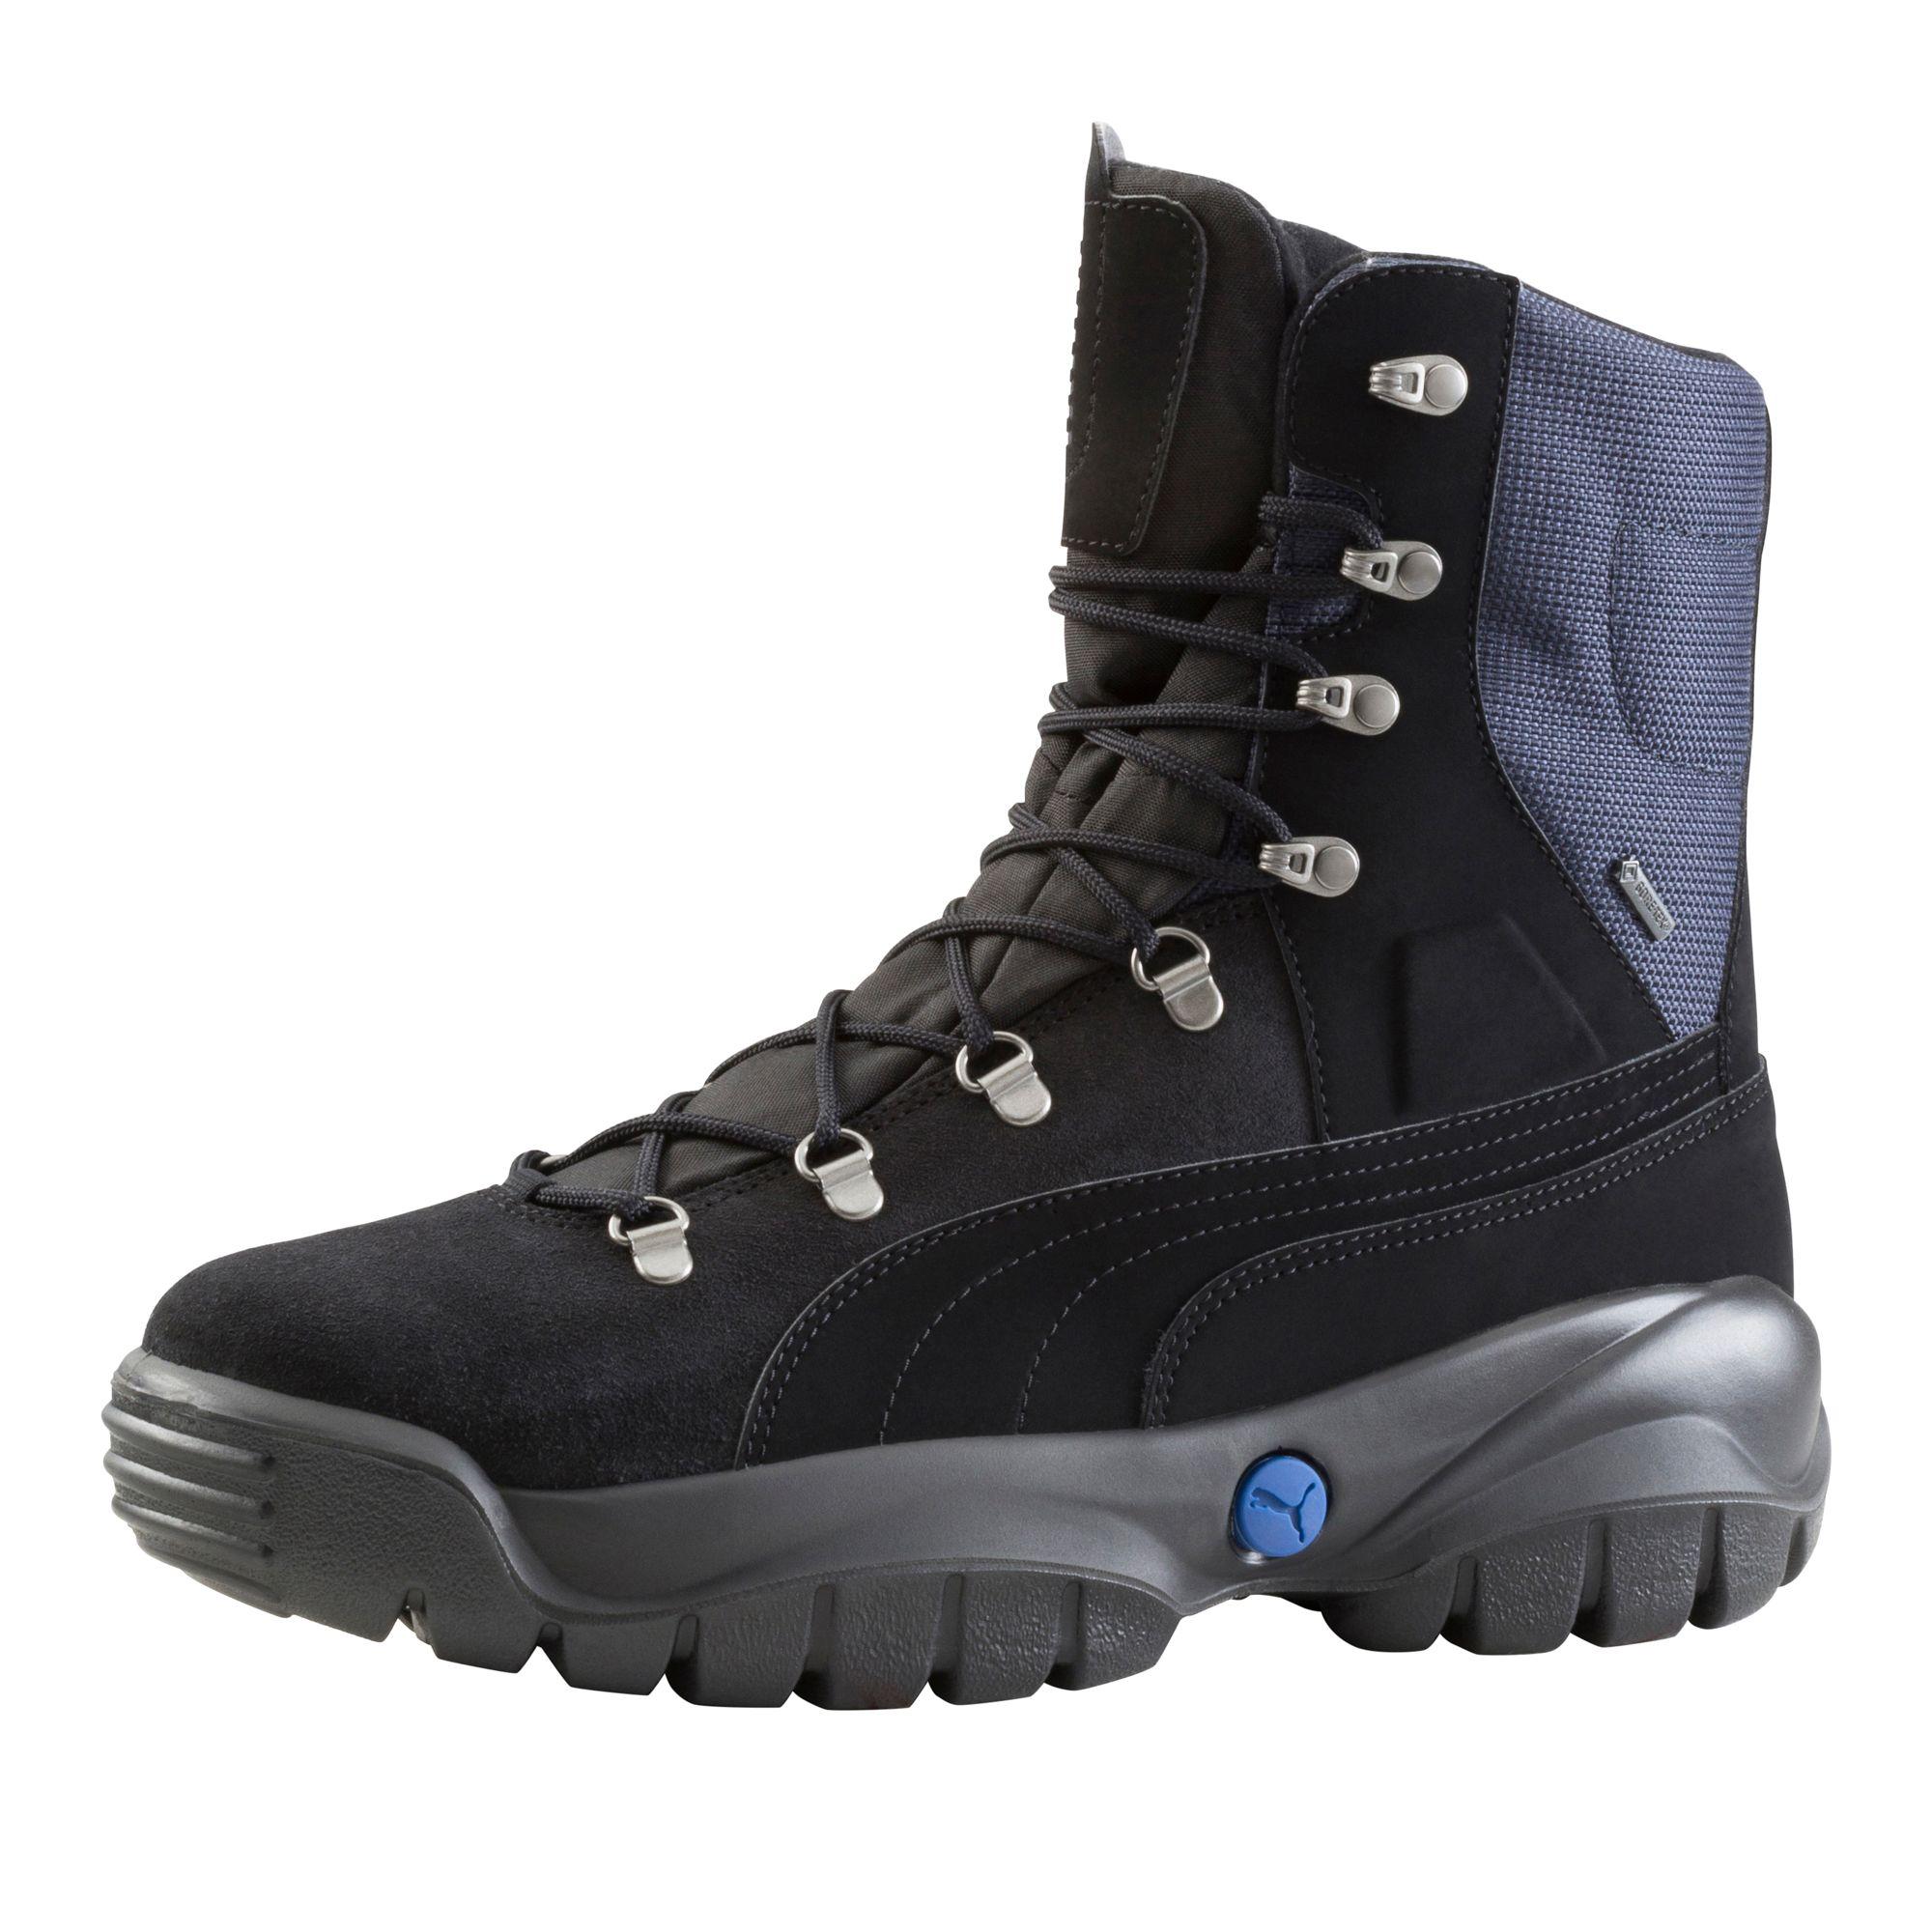 PUMA-Nivinar-GTX-Snow-Boots-Footwear-Winter-Shoes-